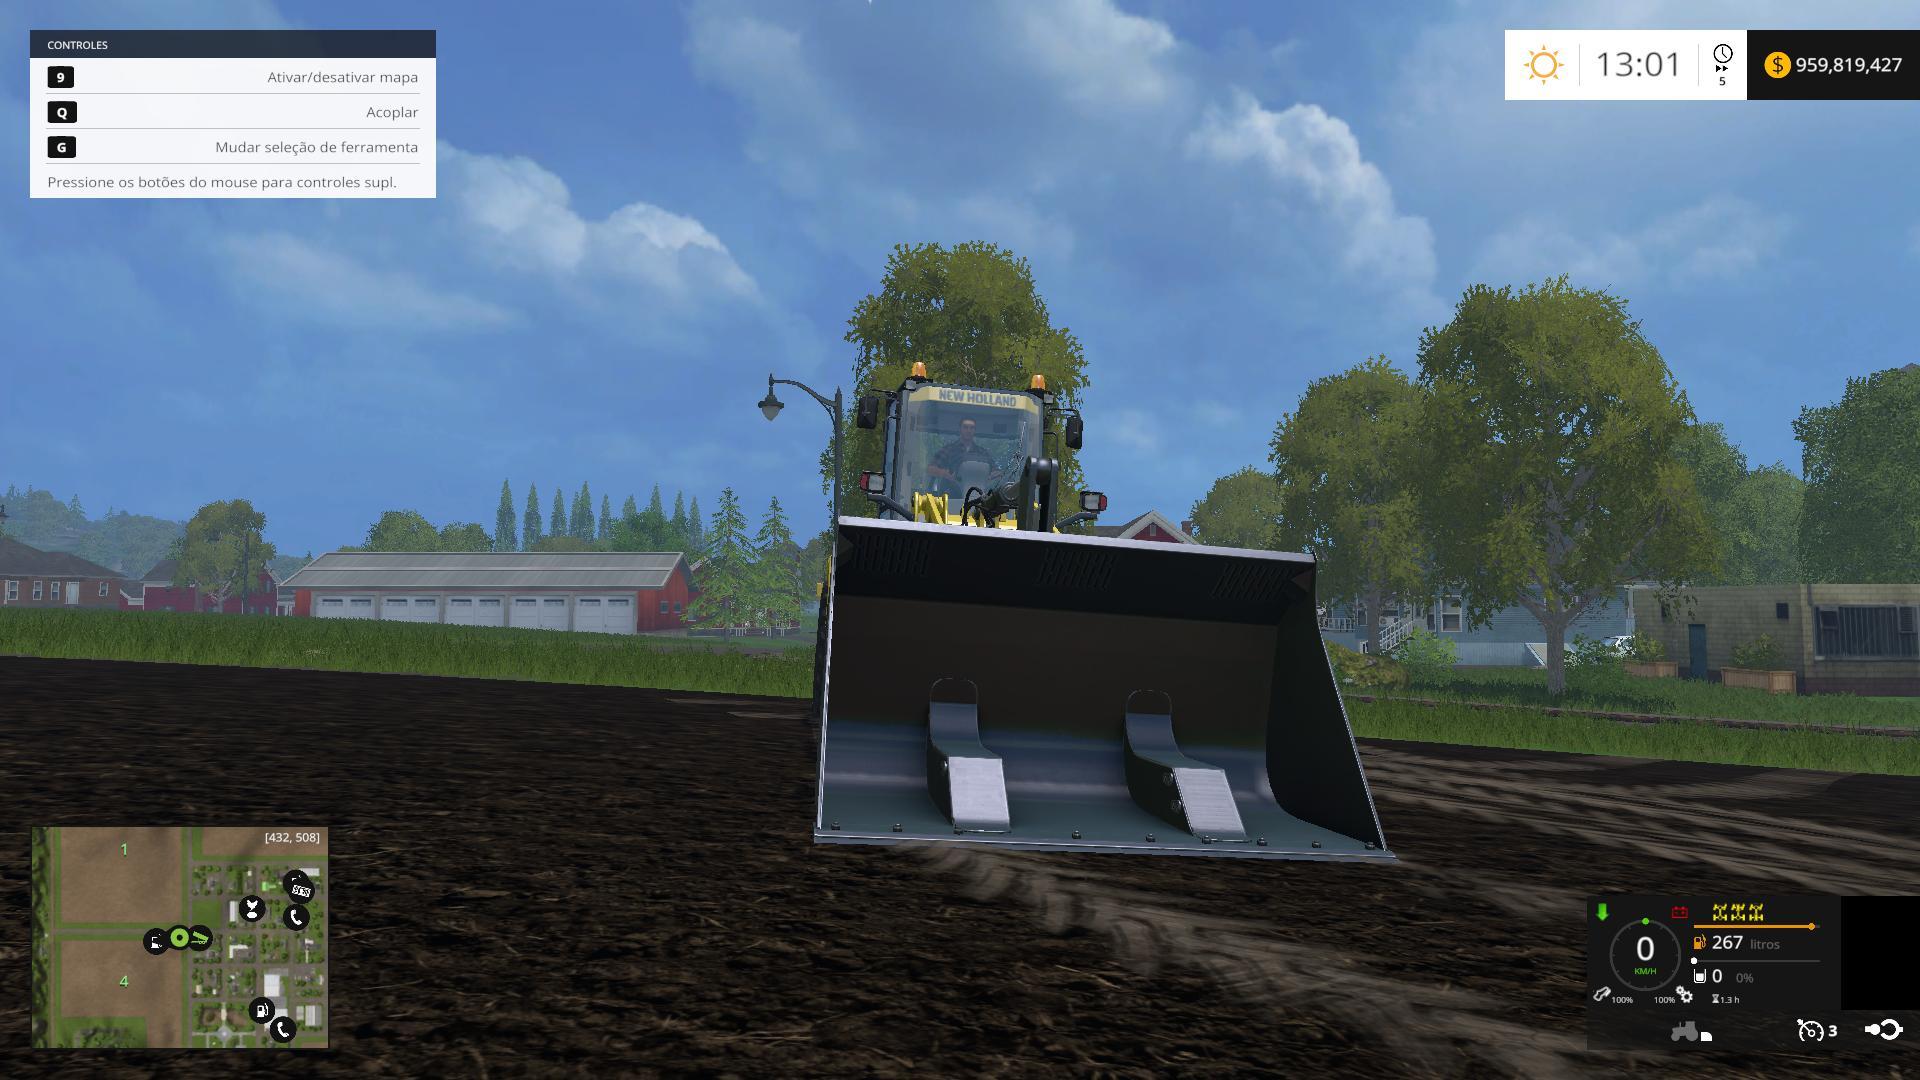 new-holland-shovel-10-000-liters-fs-2015_1